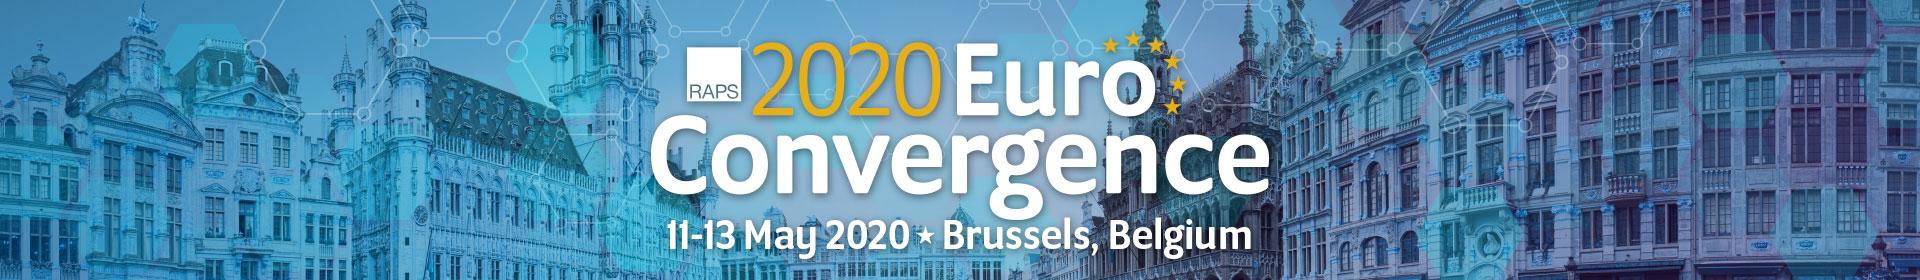 RAPS Regulatory Conference - Europe 2020 Event Banner